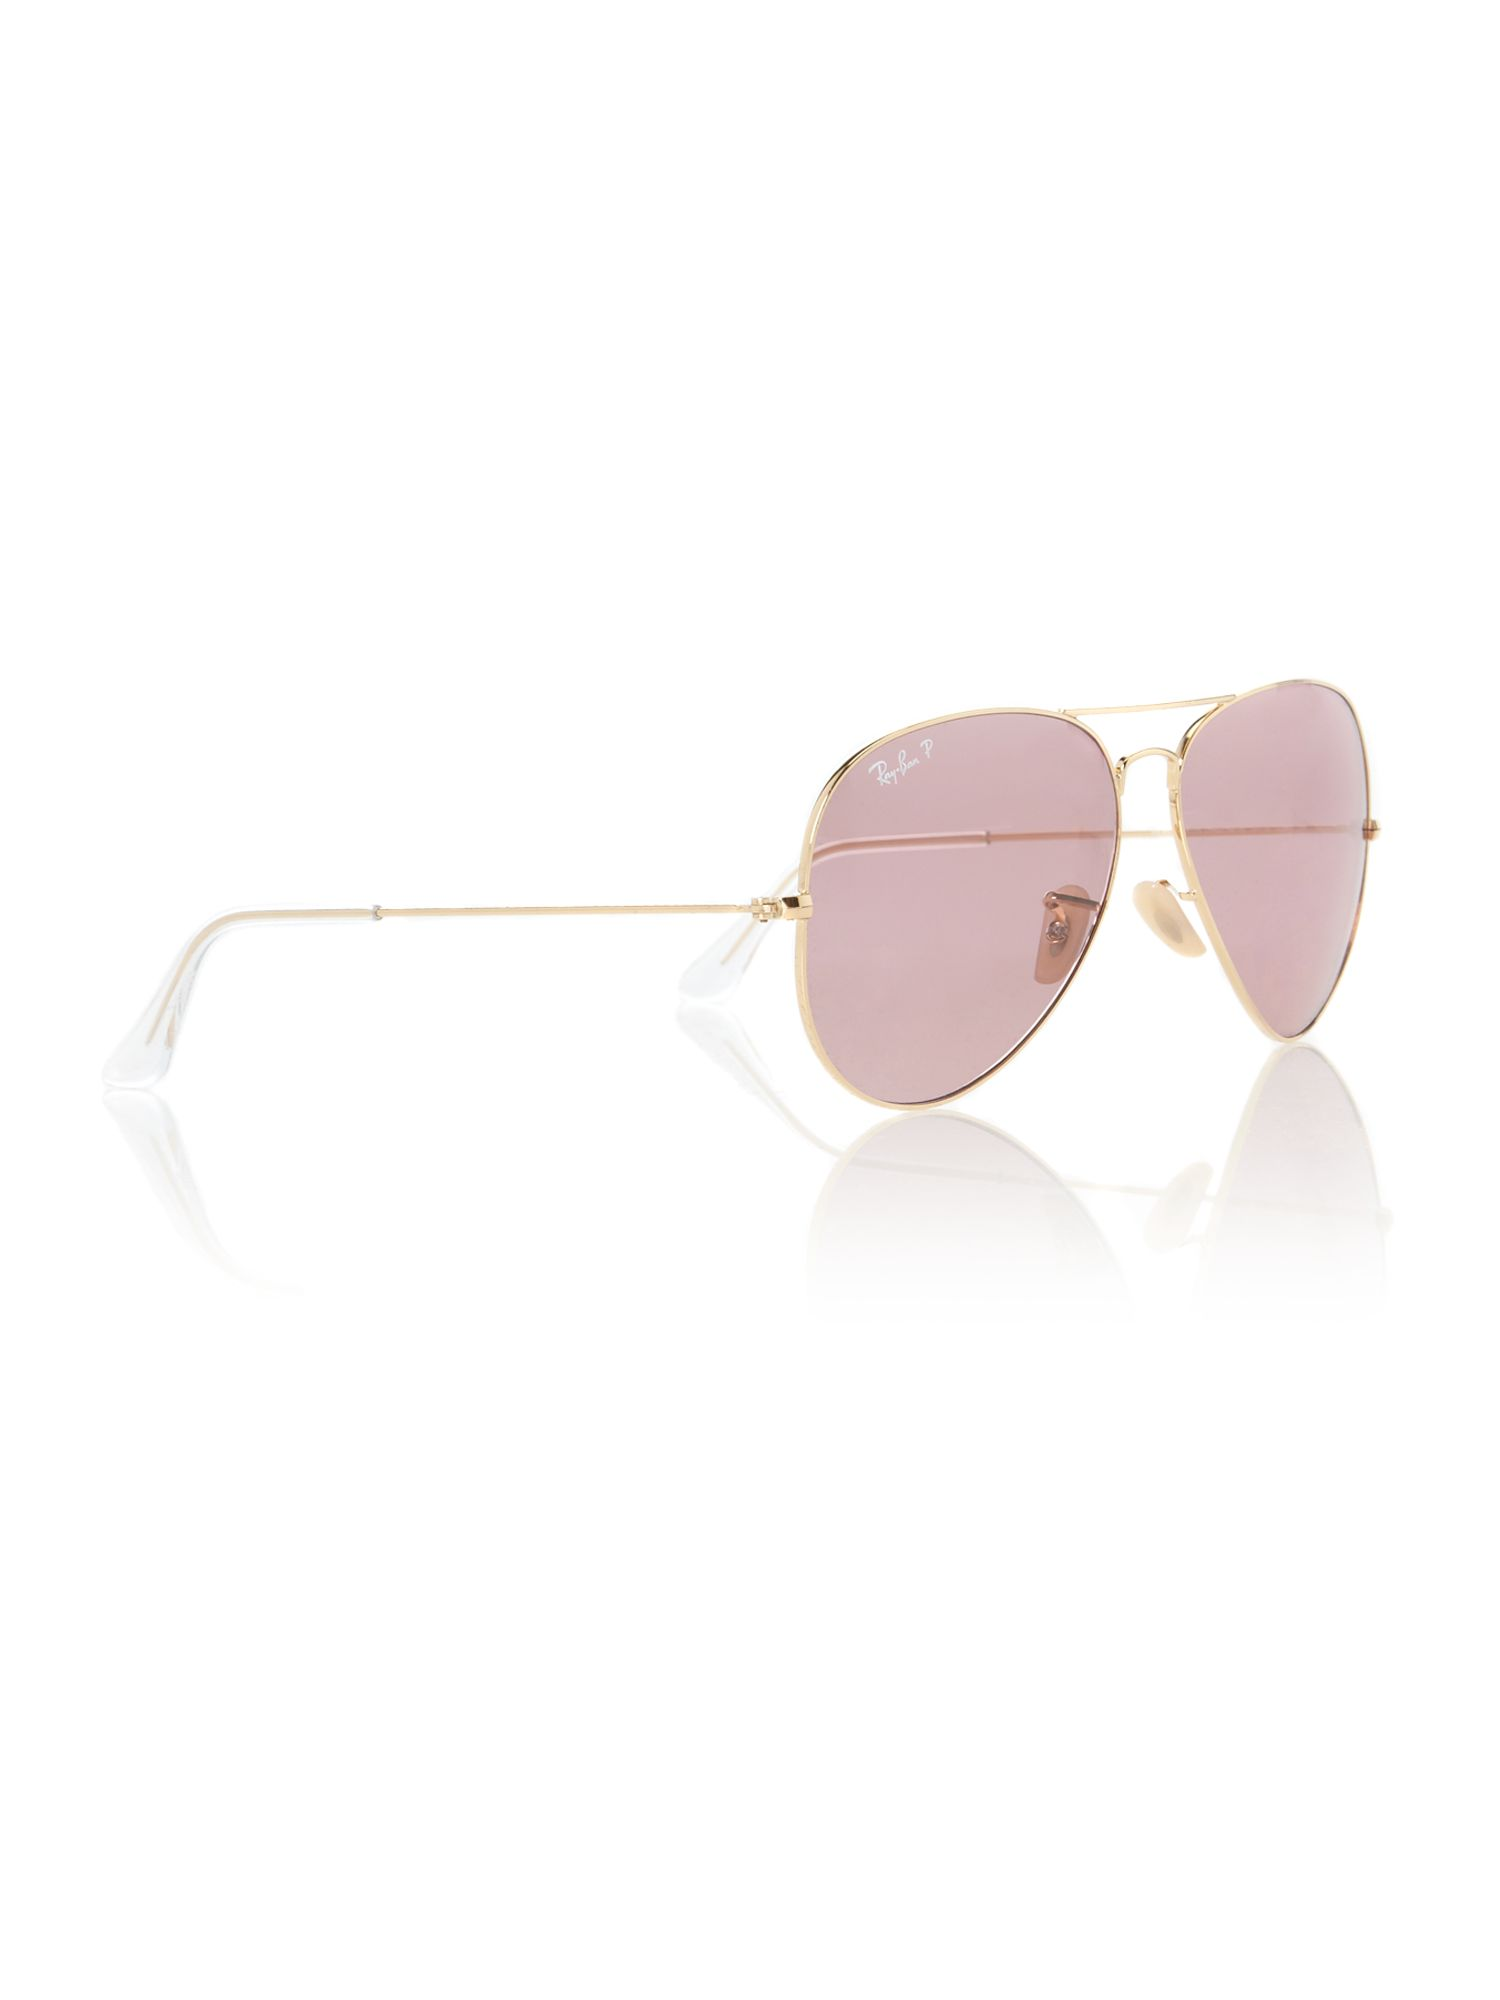 Polar 1 Sunglasses  ray ban mens 62 polar aviator sunglasses in pink for men lyst